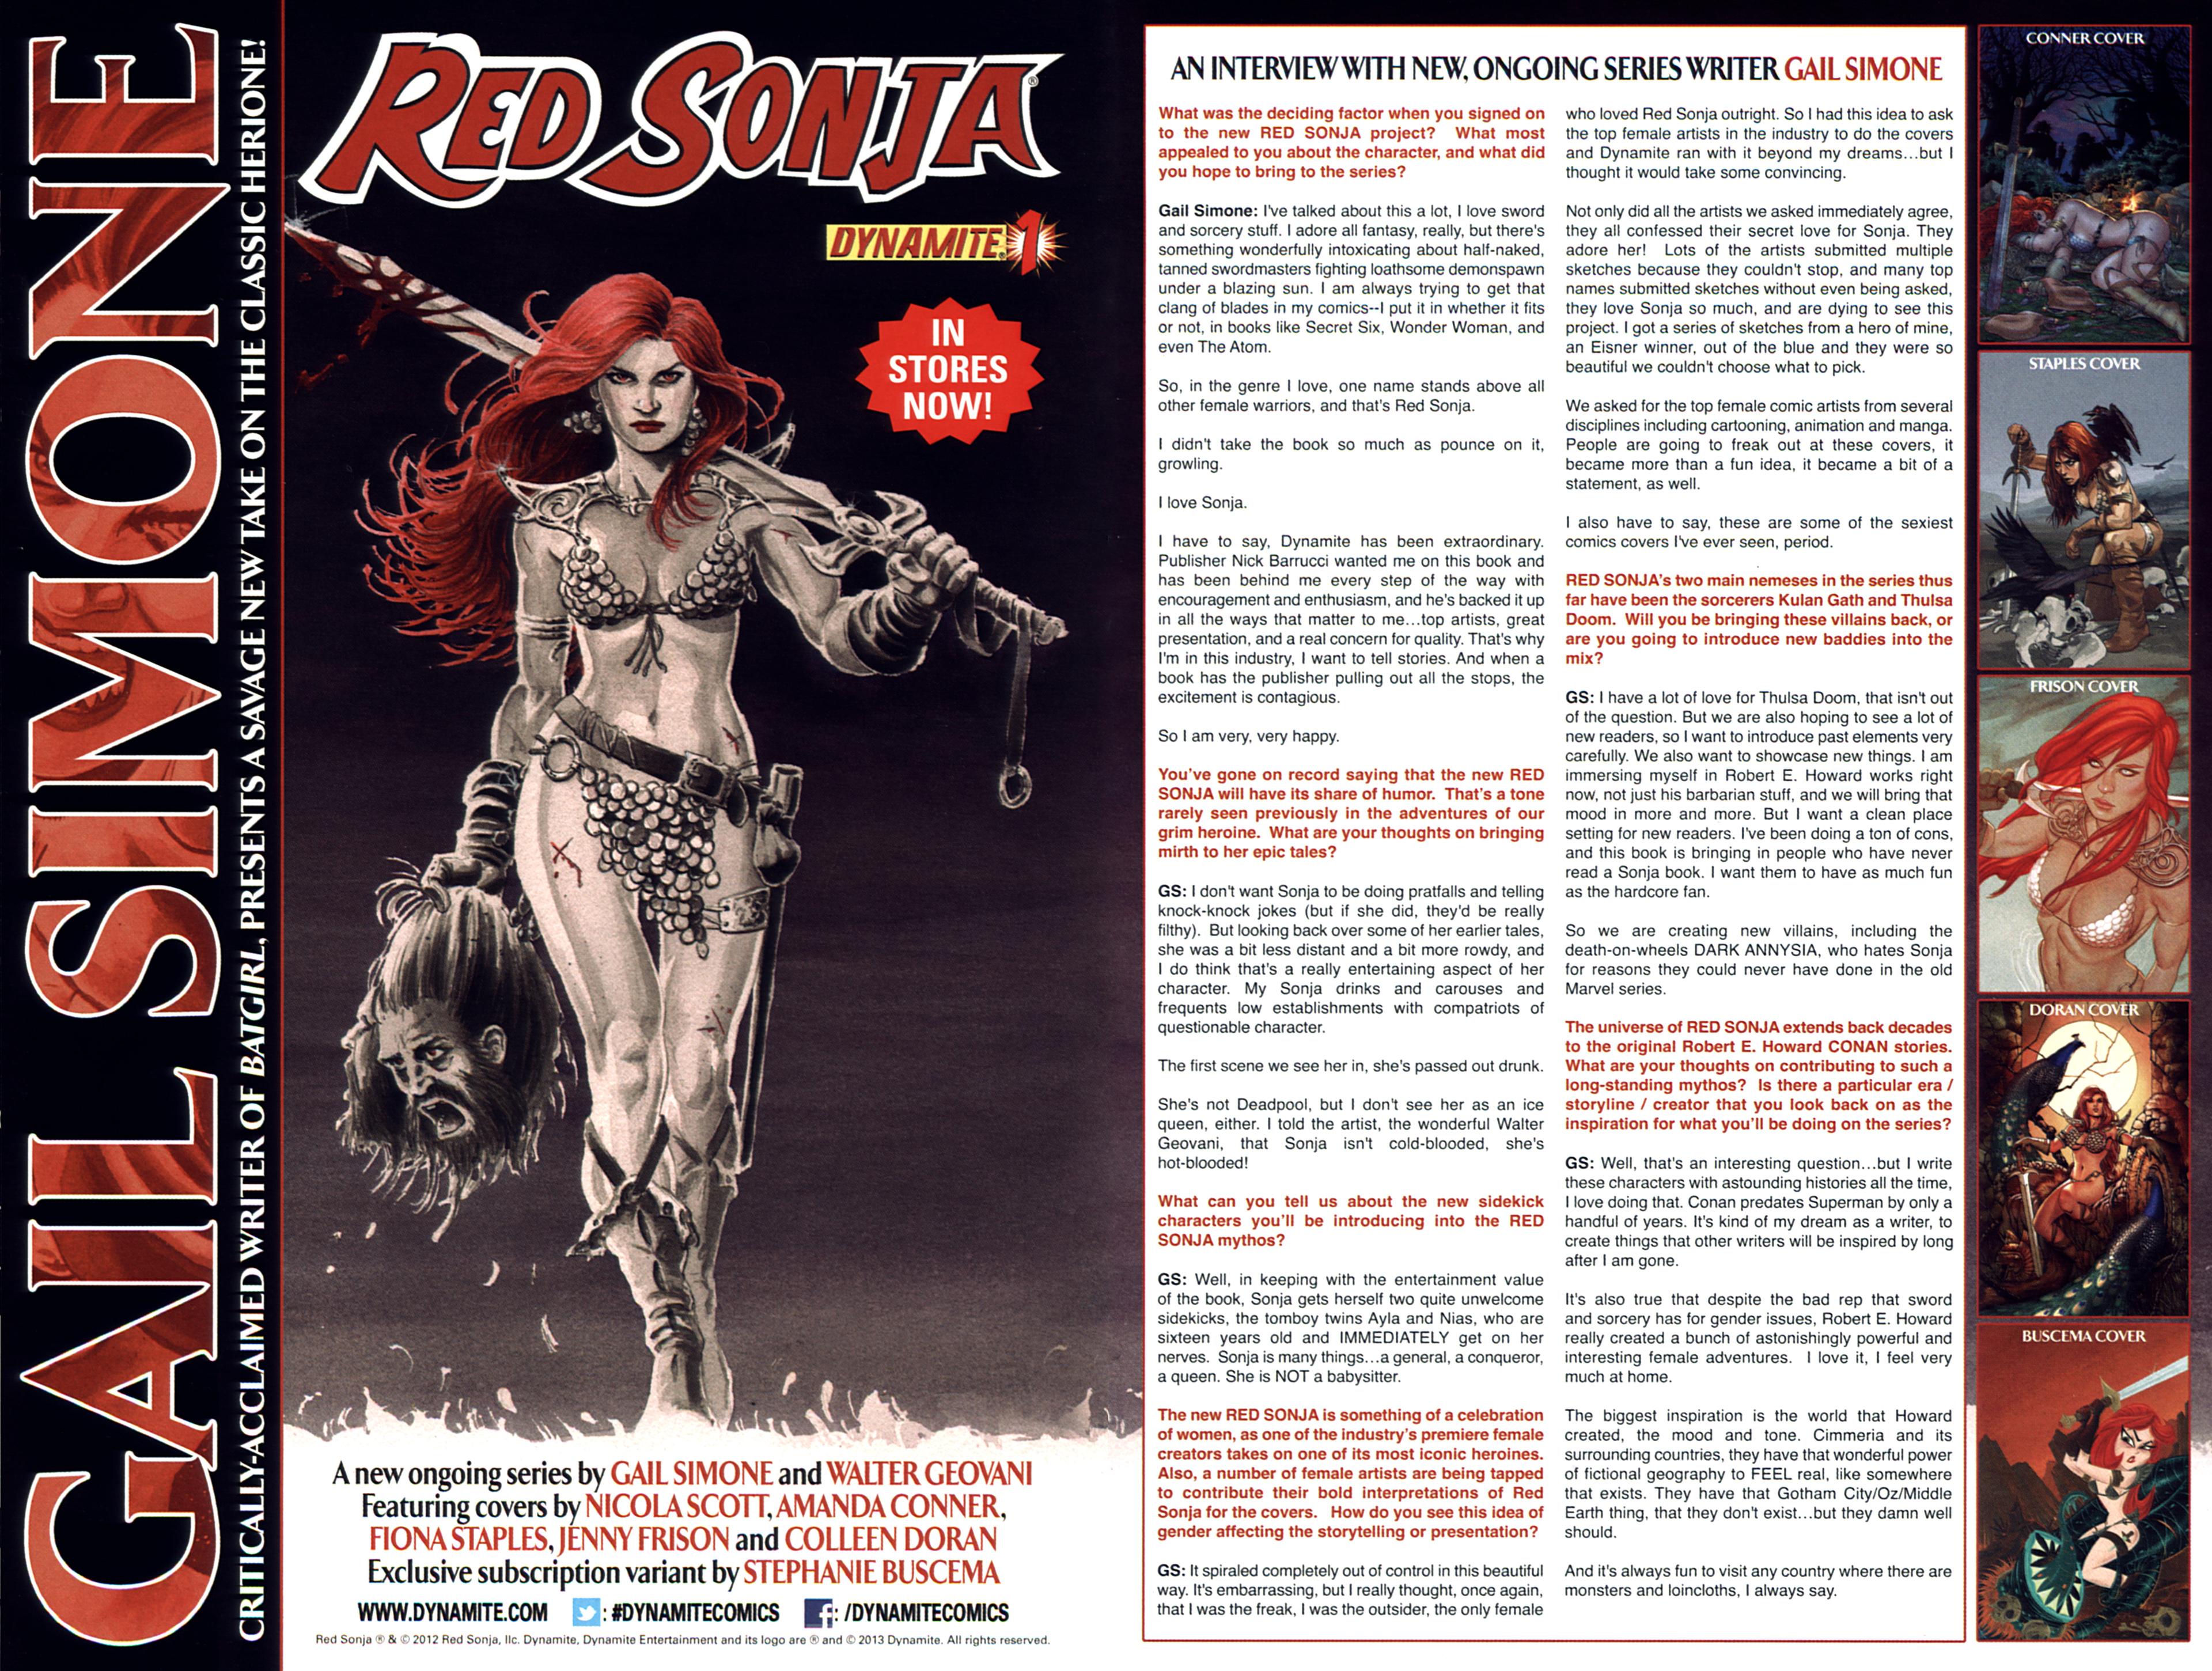 Red Sonja (2005) chap 80 pic 39